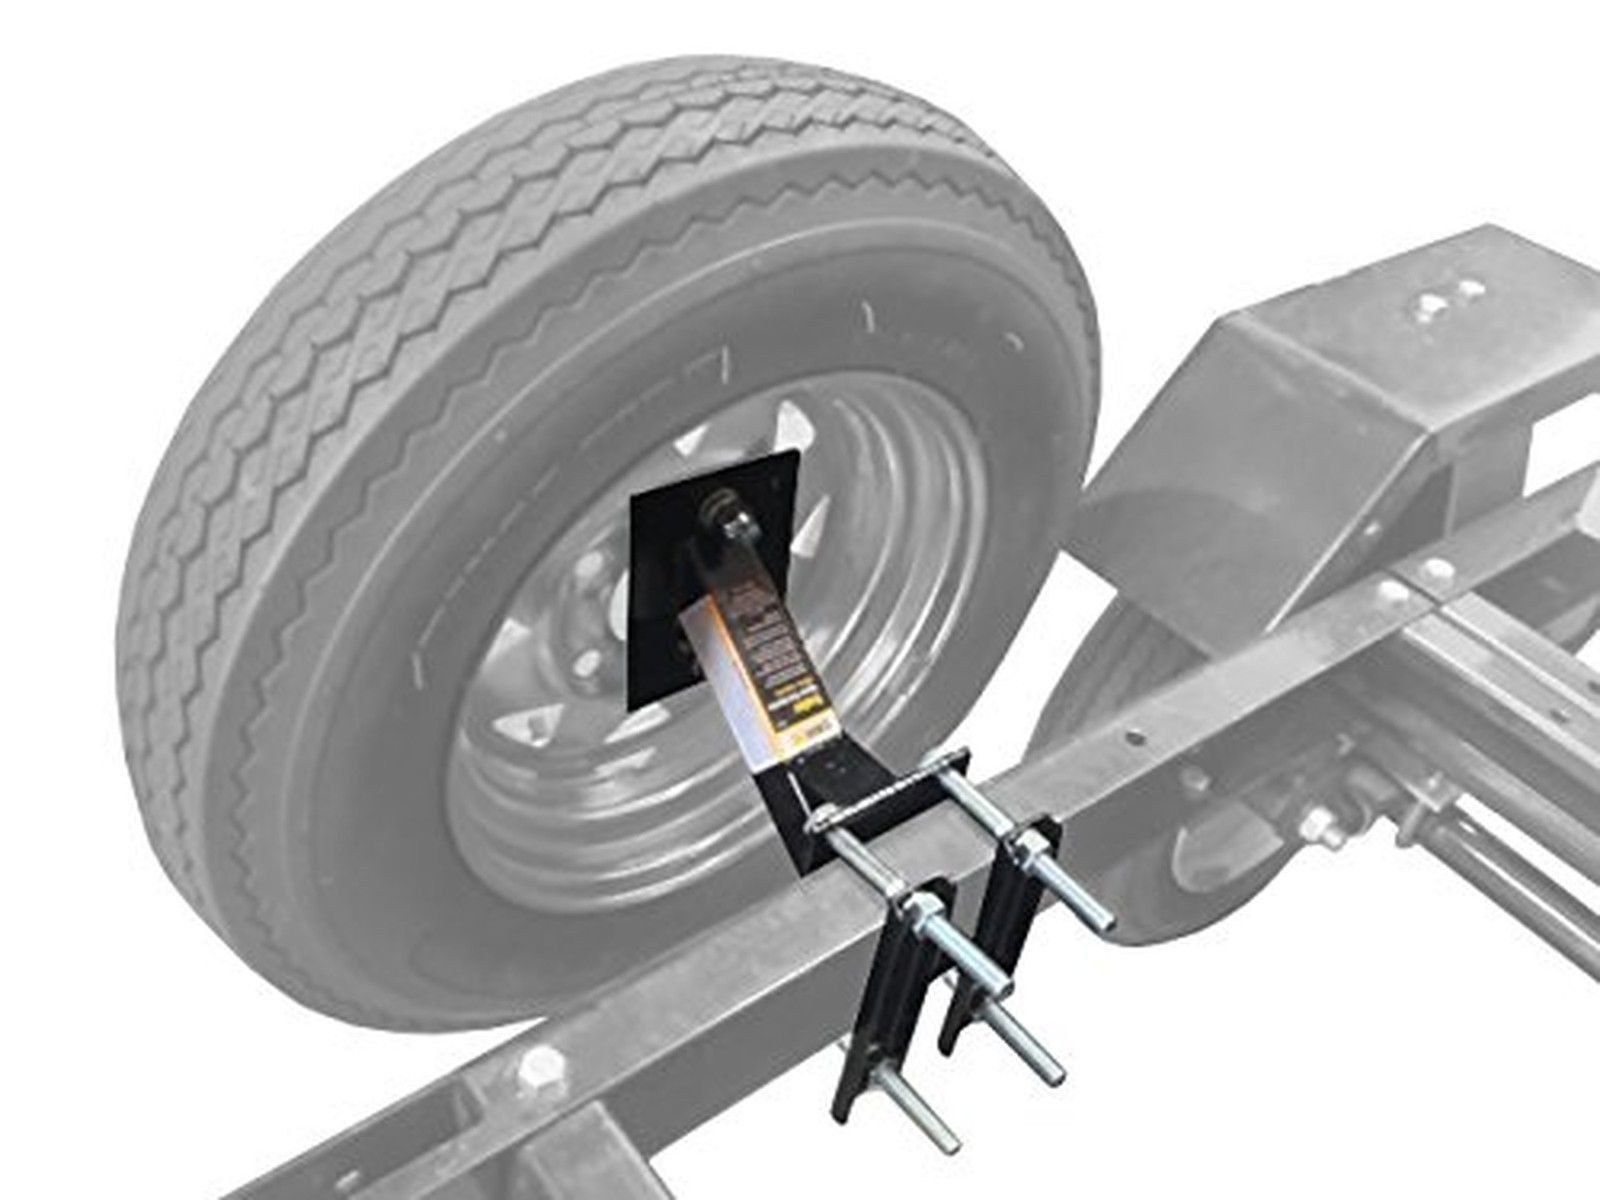 MaxxHaul 70214 Powder Coat Black Trailer Spare Tire